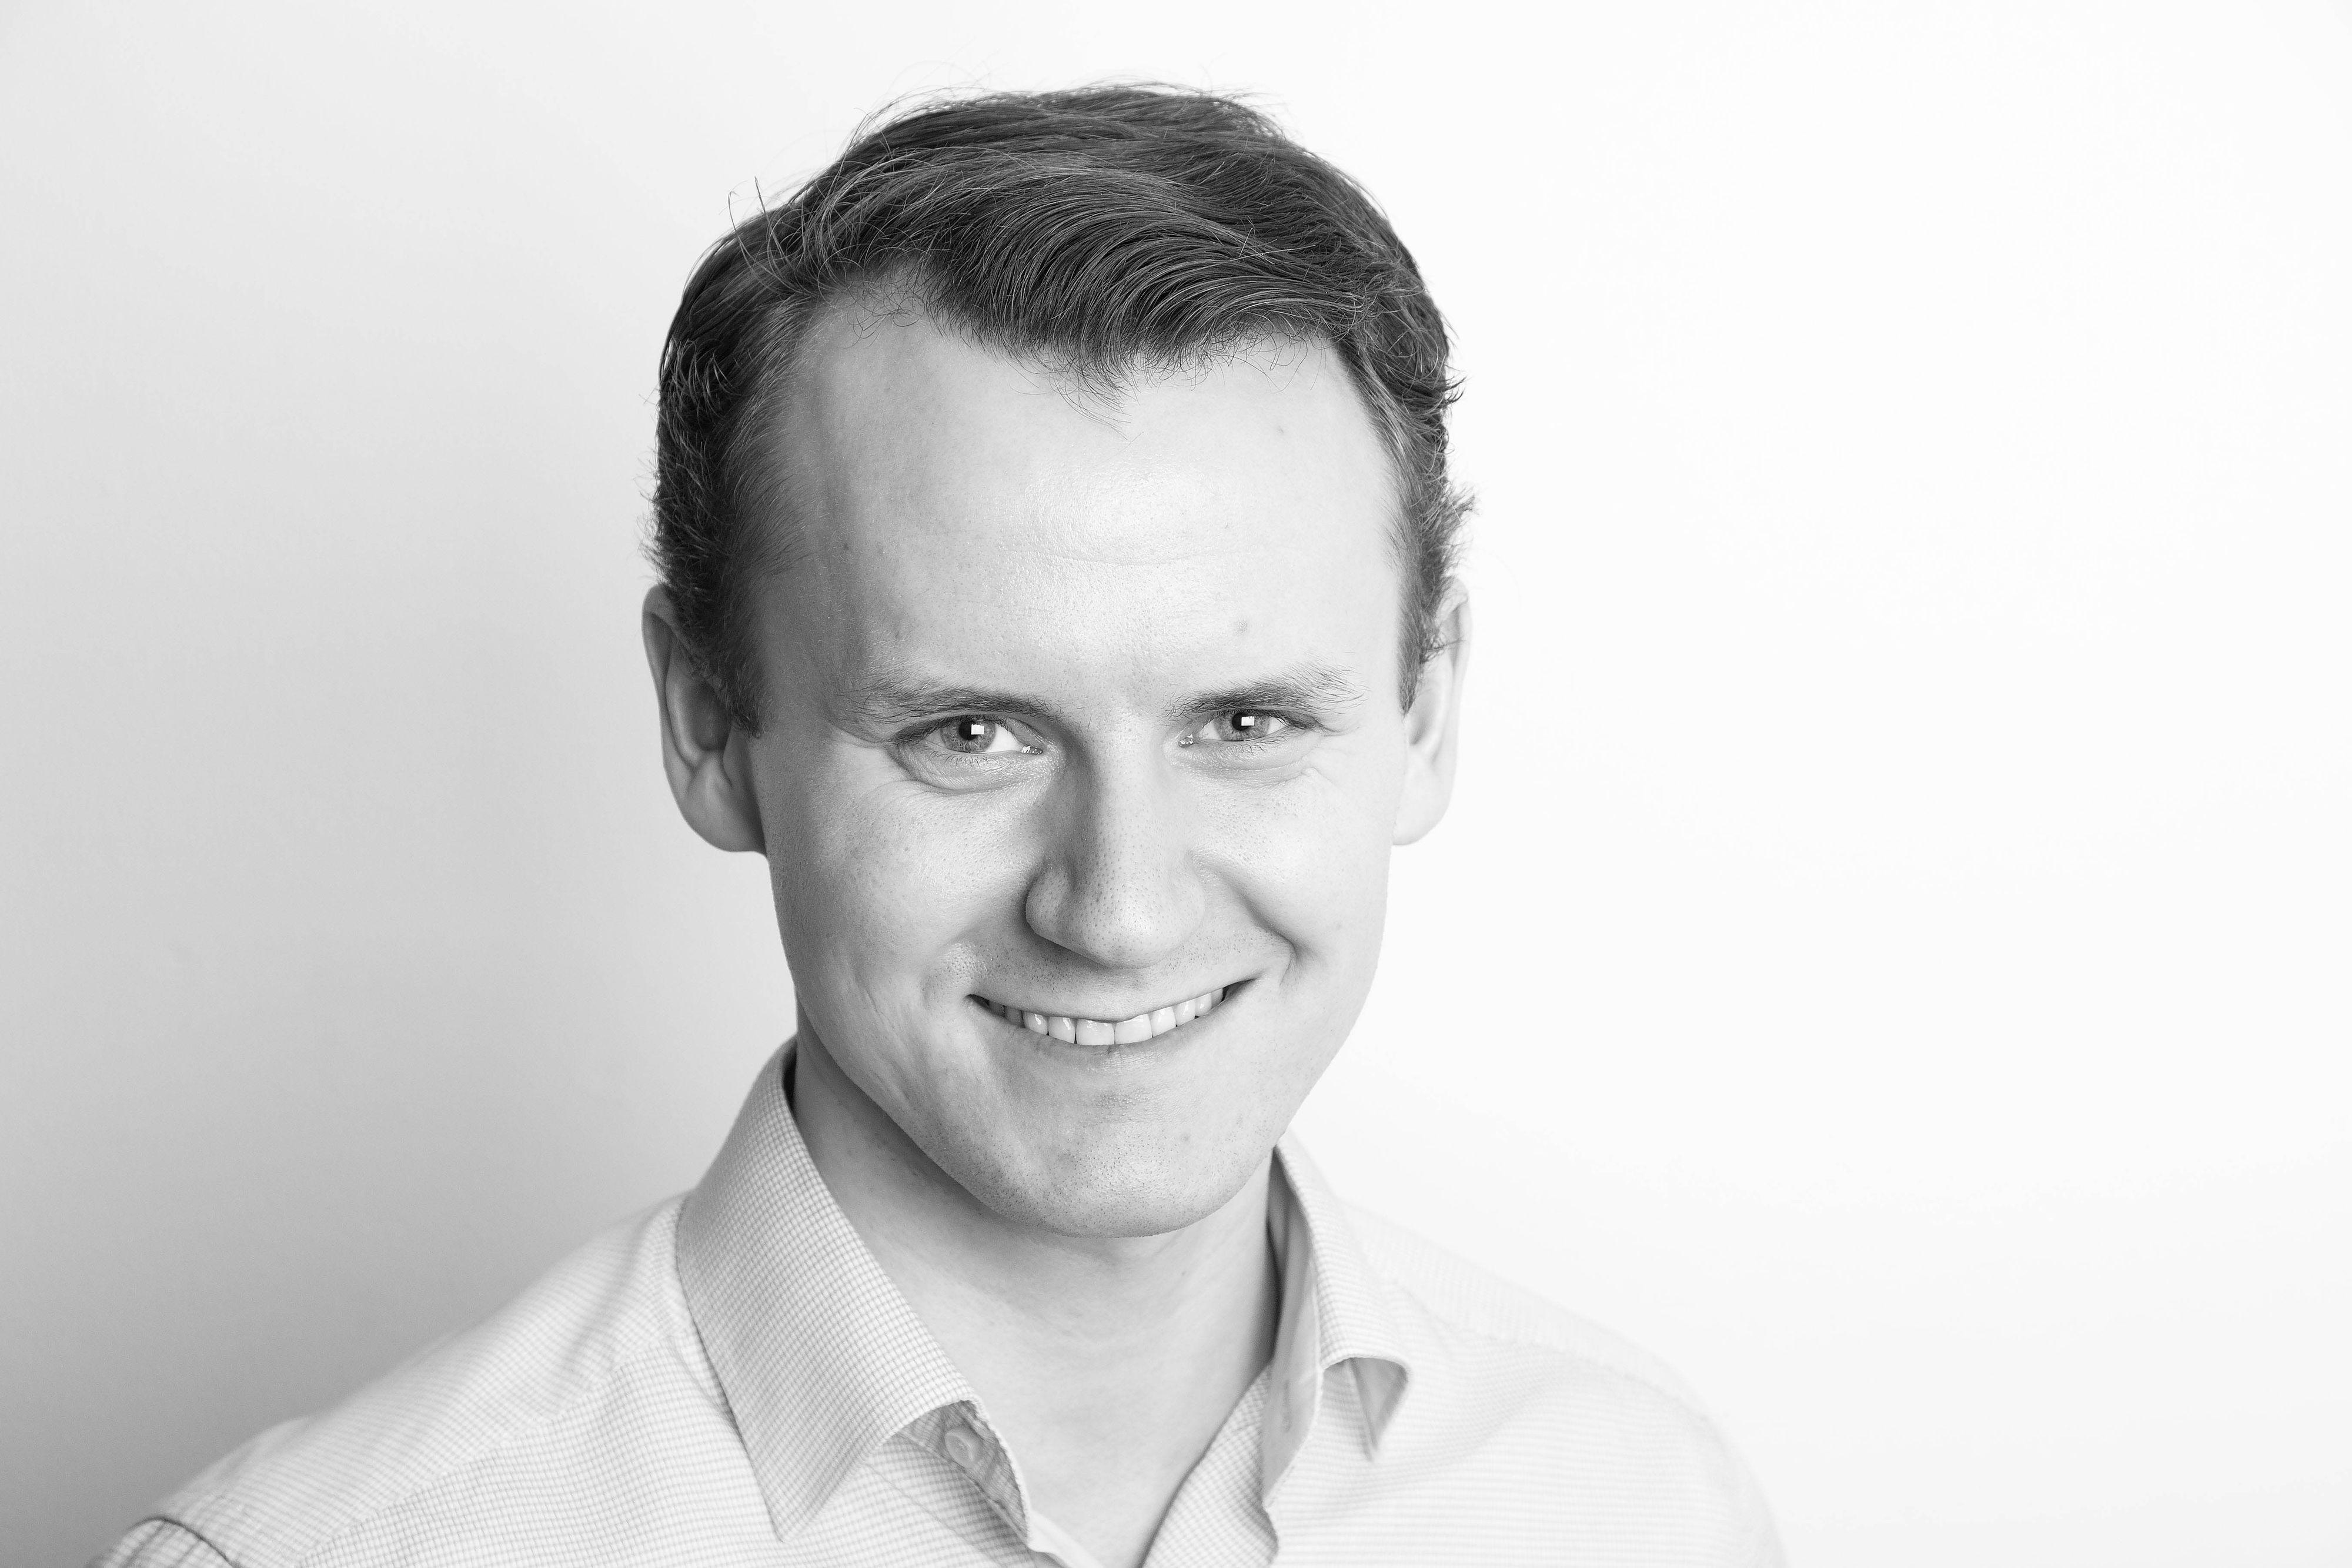 Jørgen Elton Nilsen, nyhets- og featureredaktør i Tek.no.Foto: Tek.no